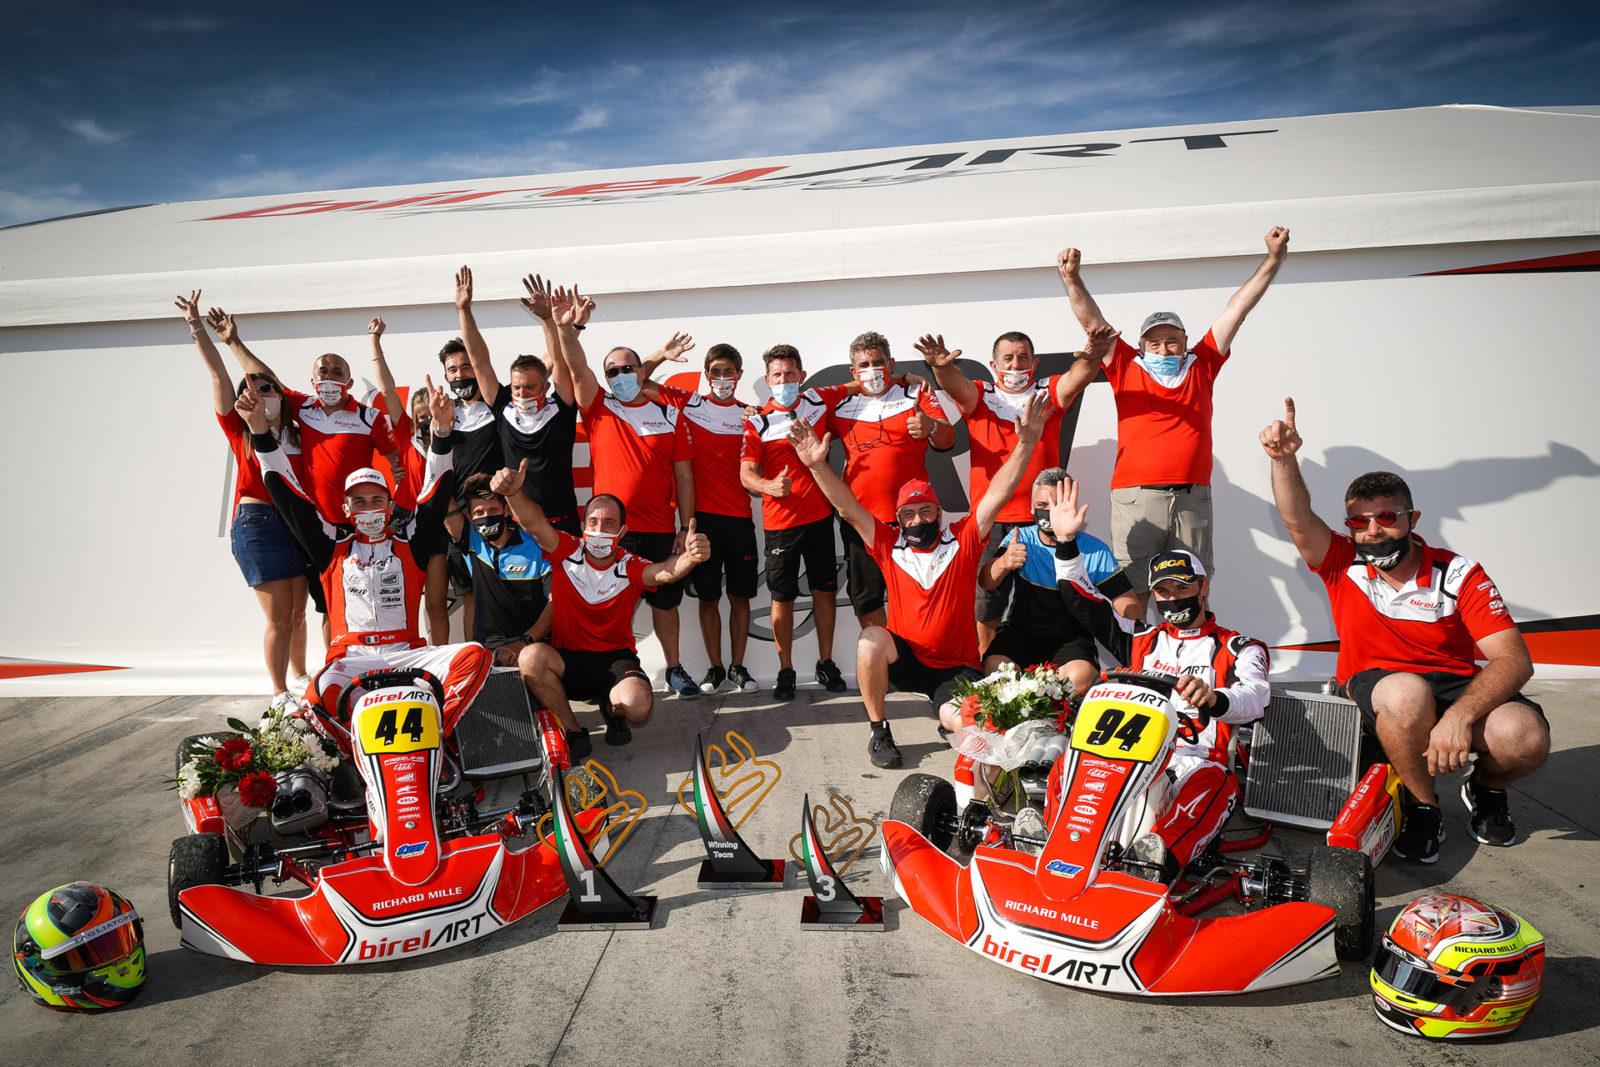 BirelART Factory Racing Team celebrates